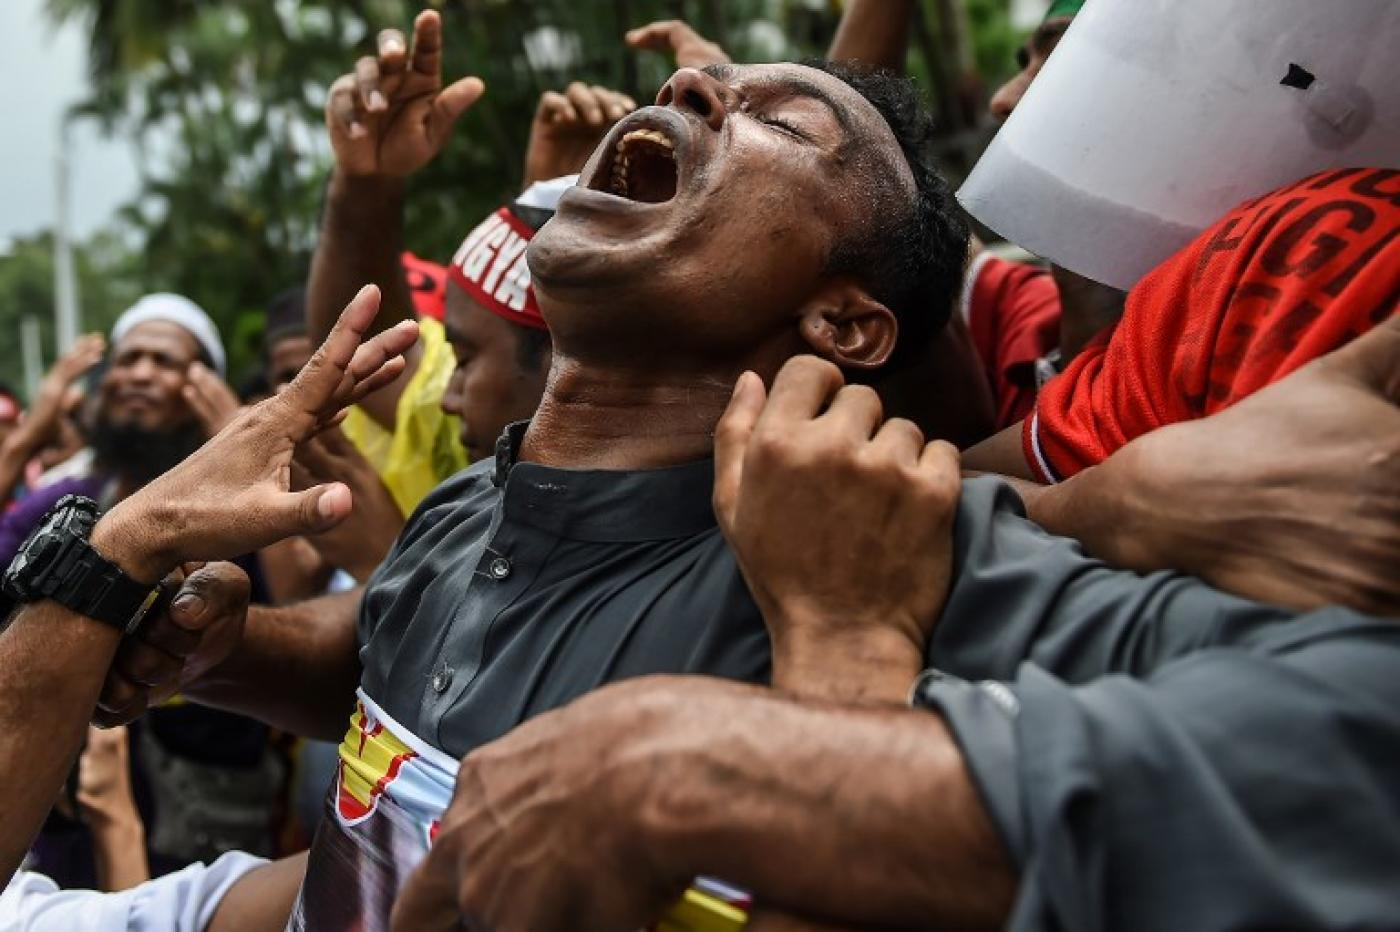 Rohingya activists bemoan failure of Muslim countries to address Myanmar crisis